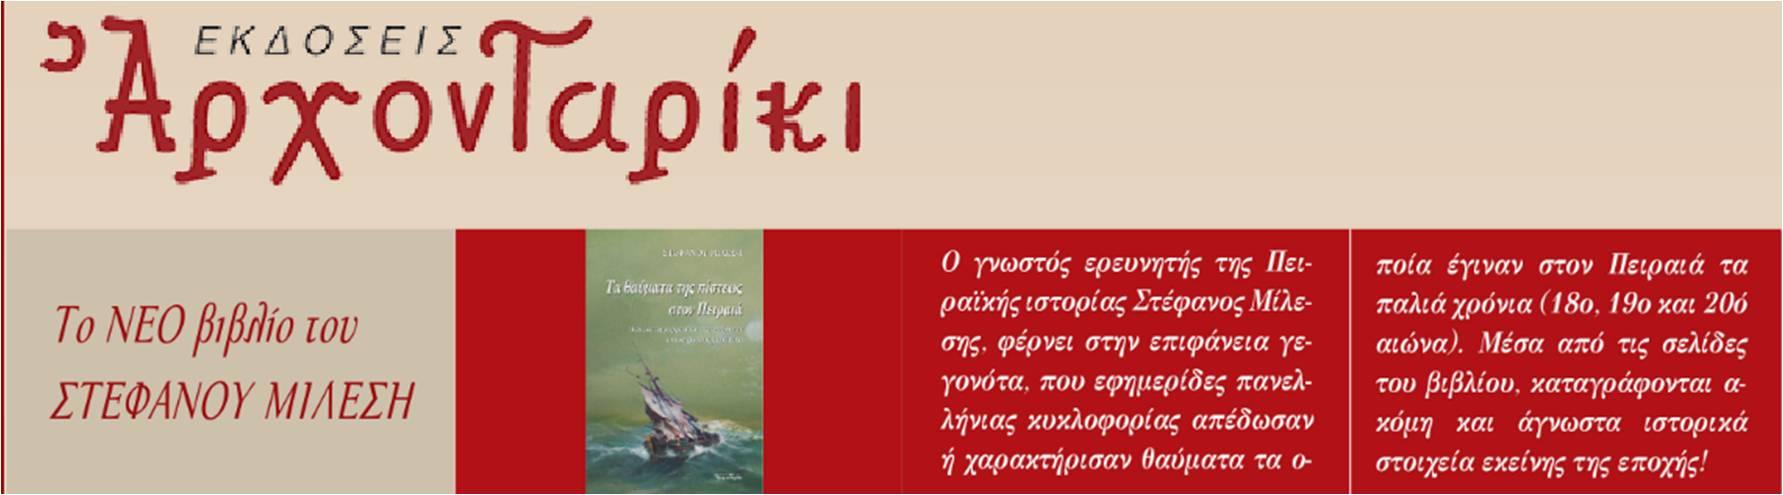 milesis book